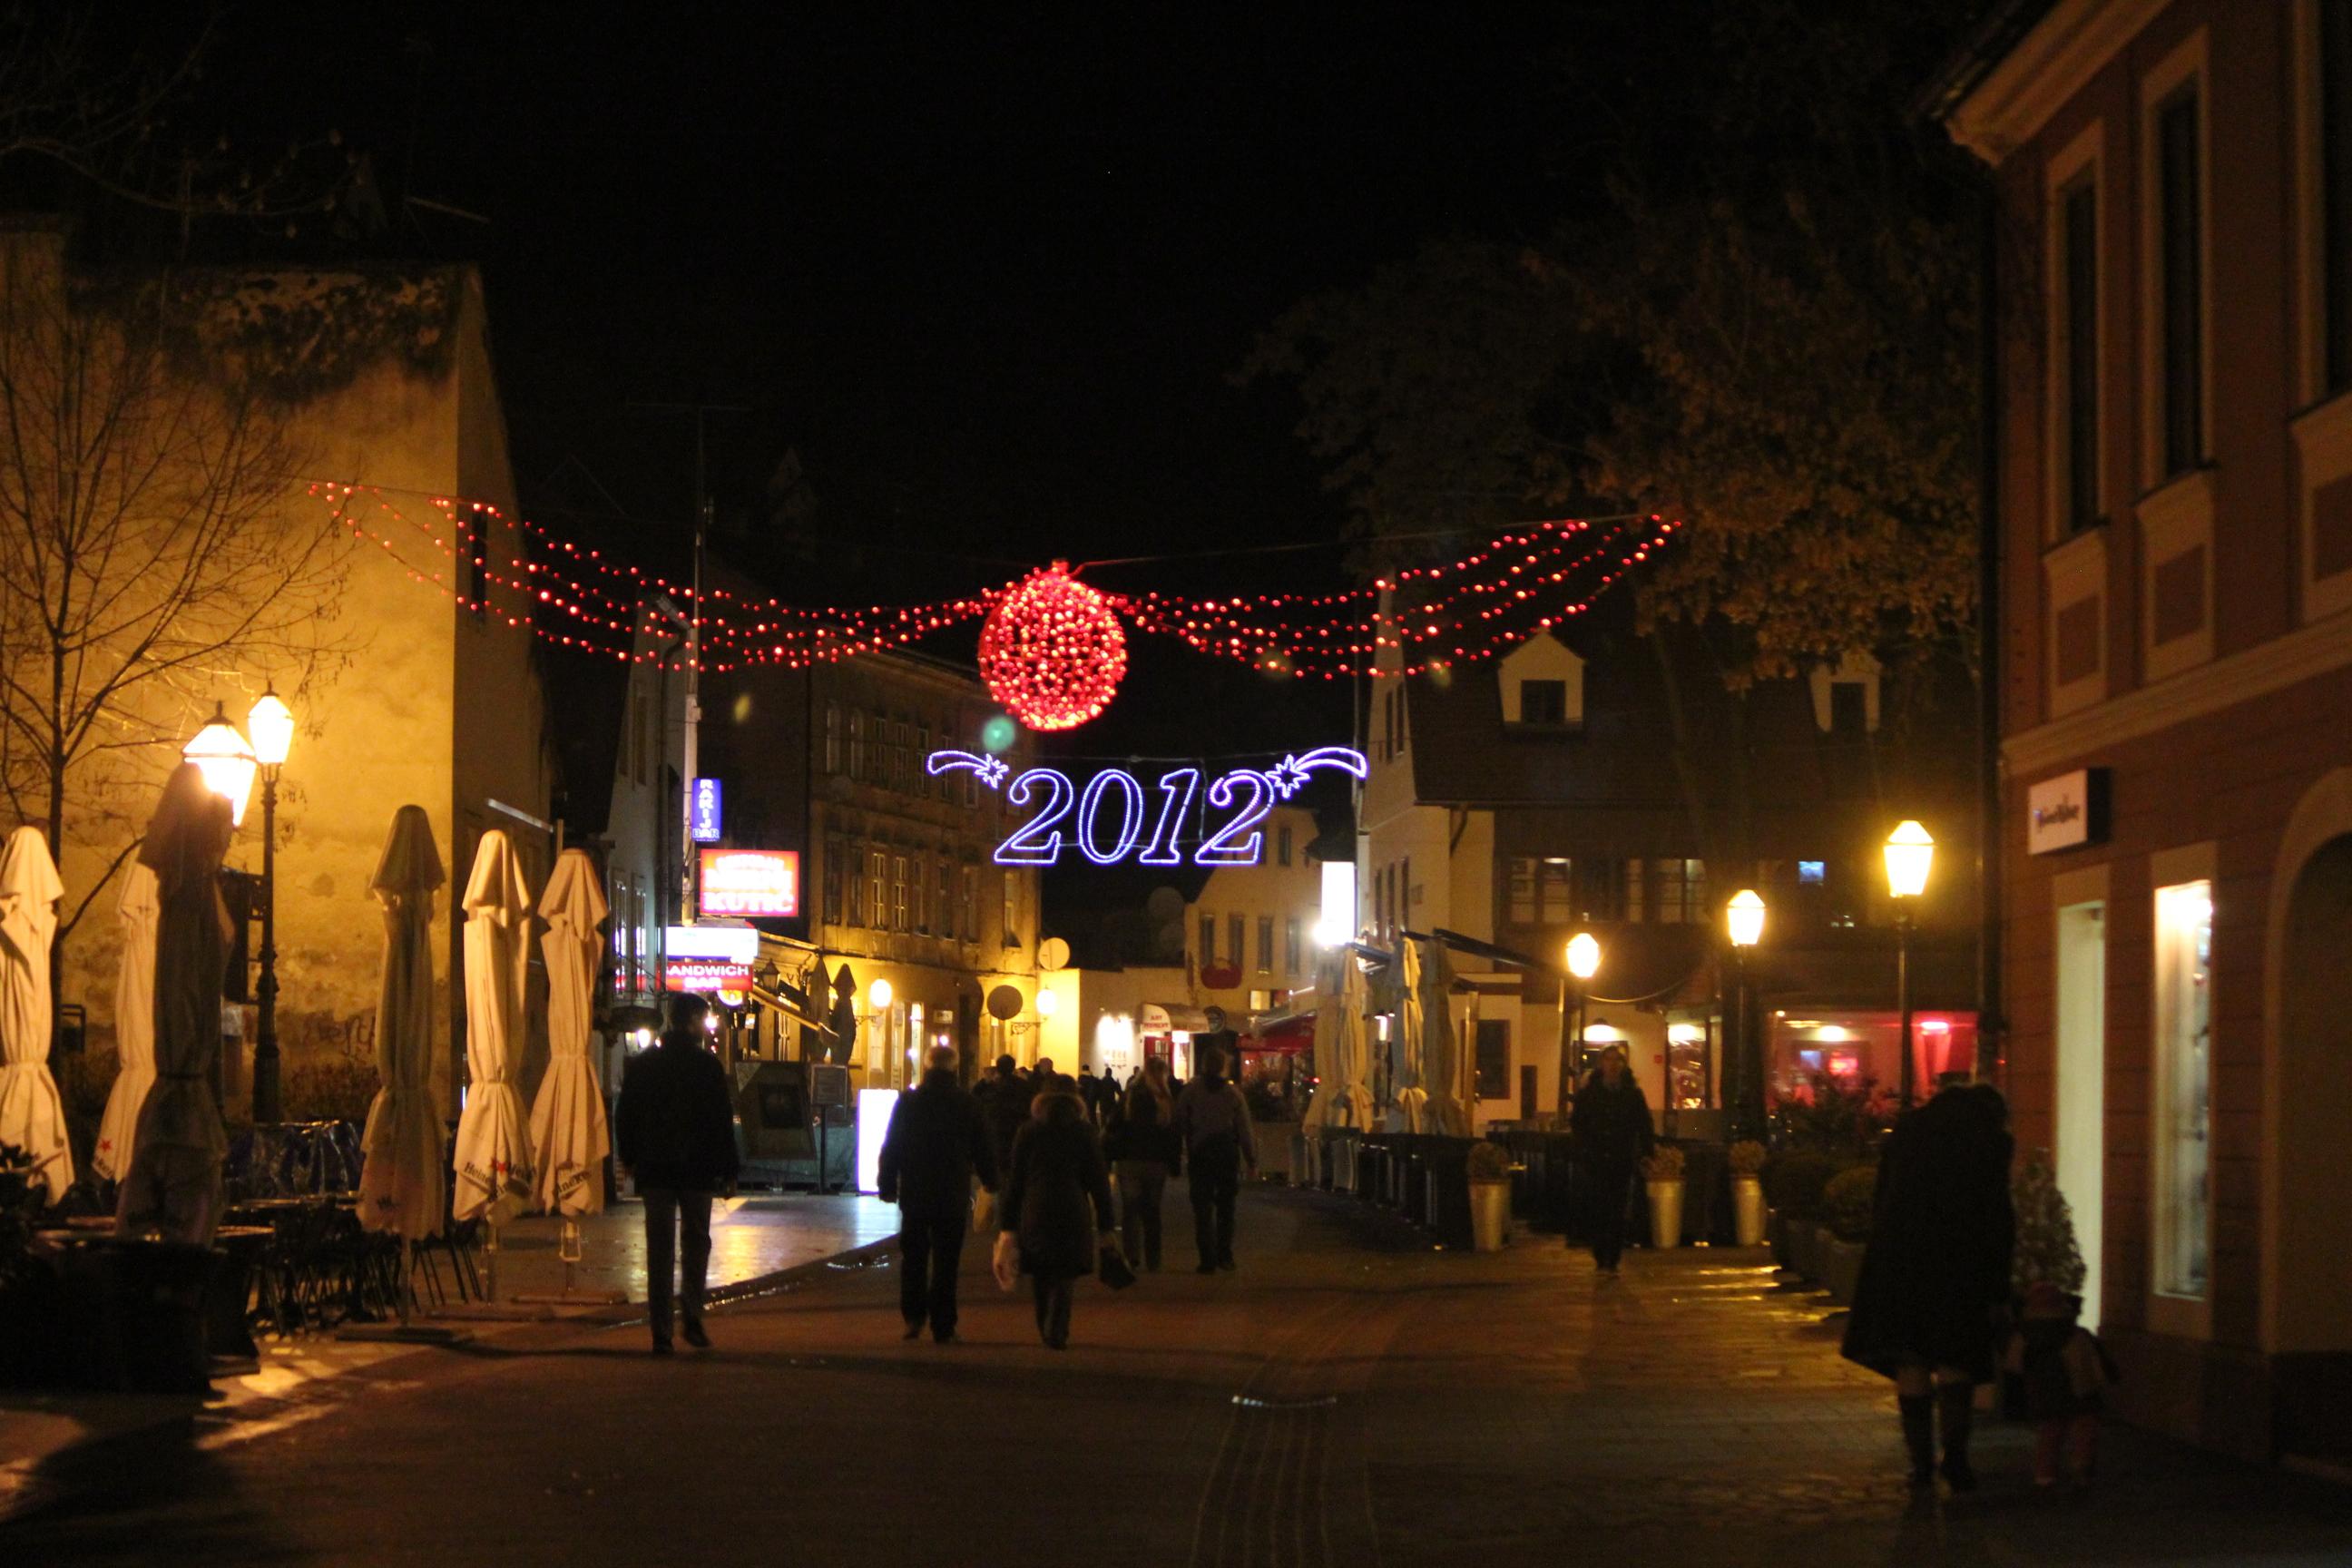 2012 Sign; Zagreb, Croatia; 2011